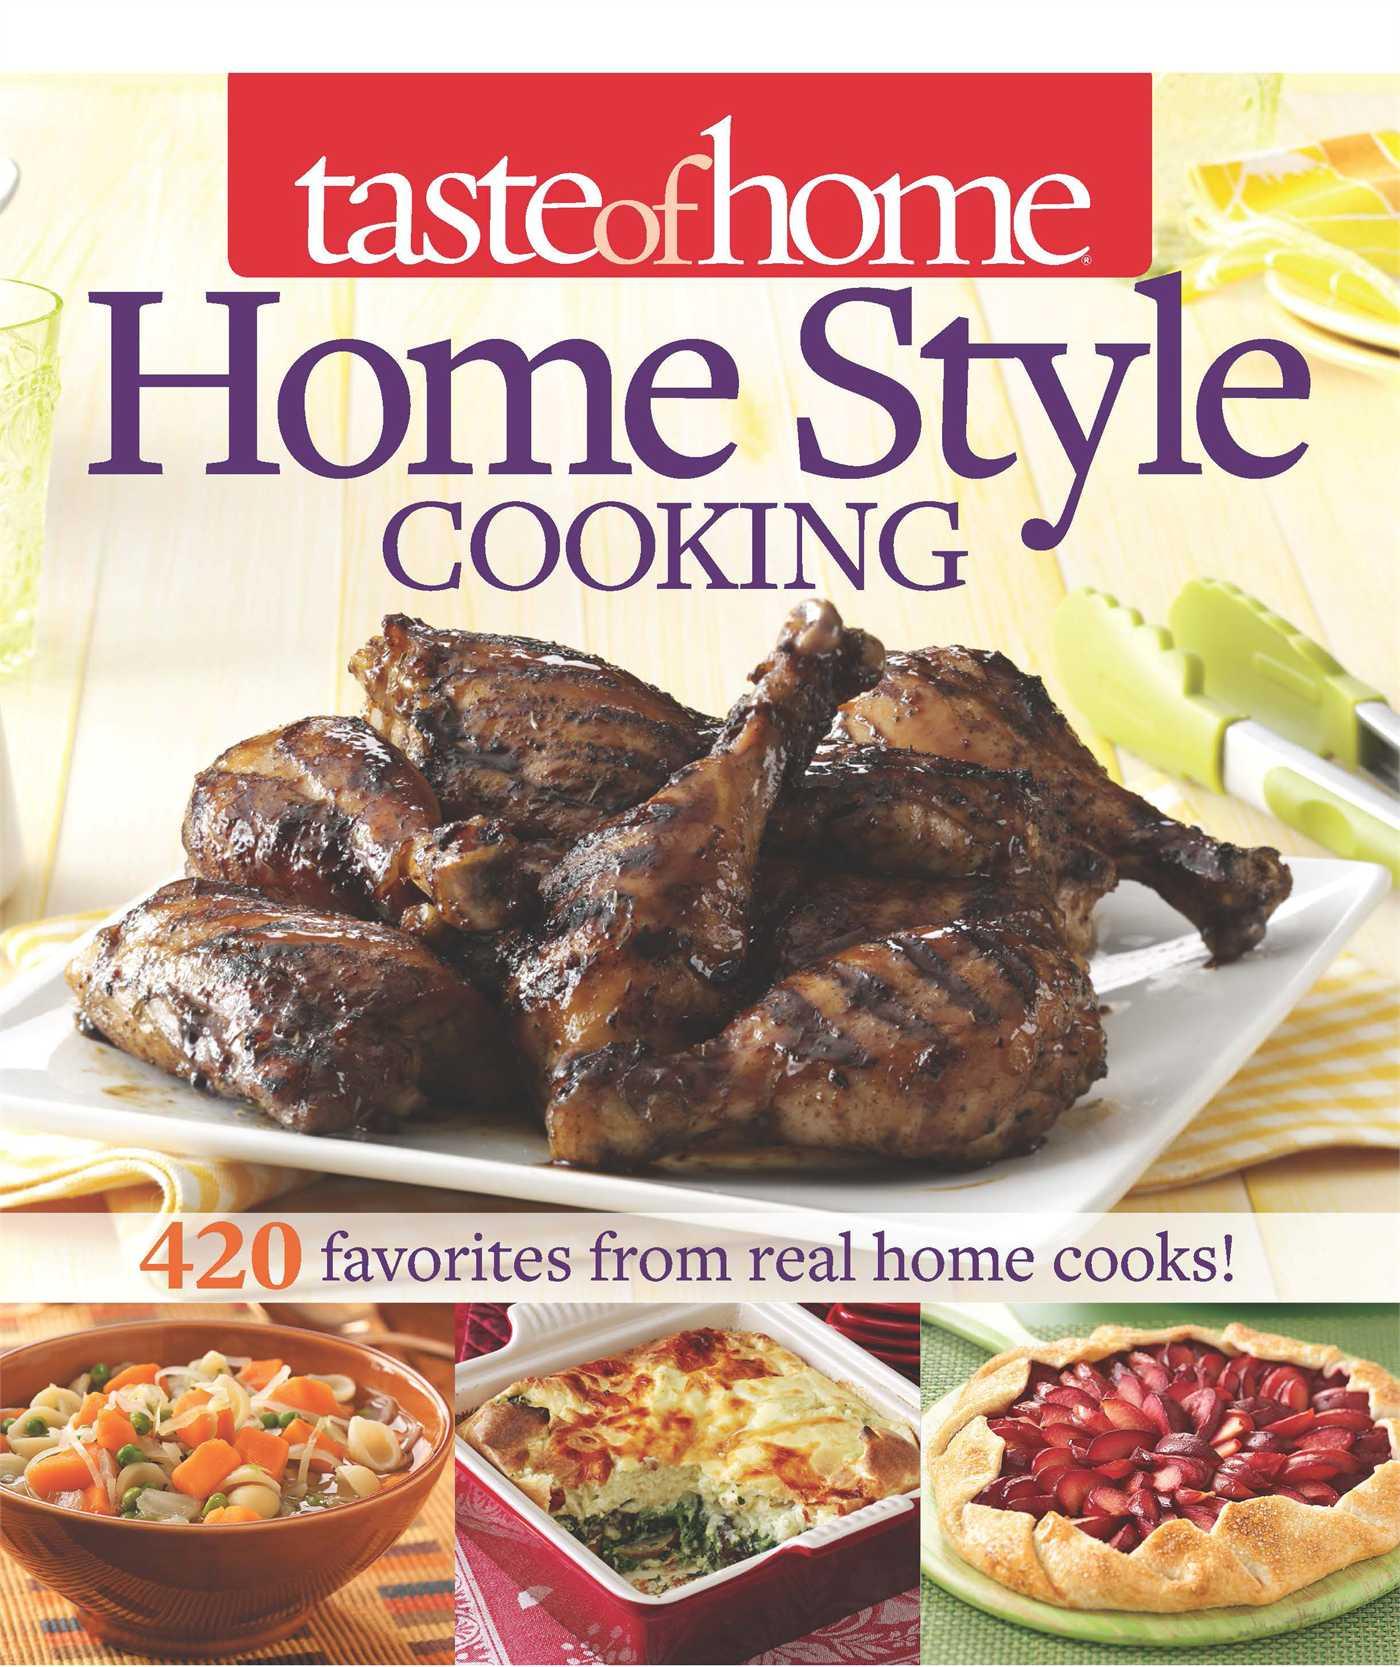 Taste of home home style cooking book by taste of home official taste of home home style cooking 9781617651618 hr forumfinder Gallery